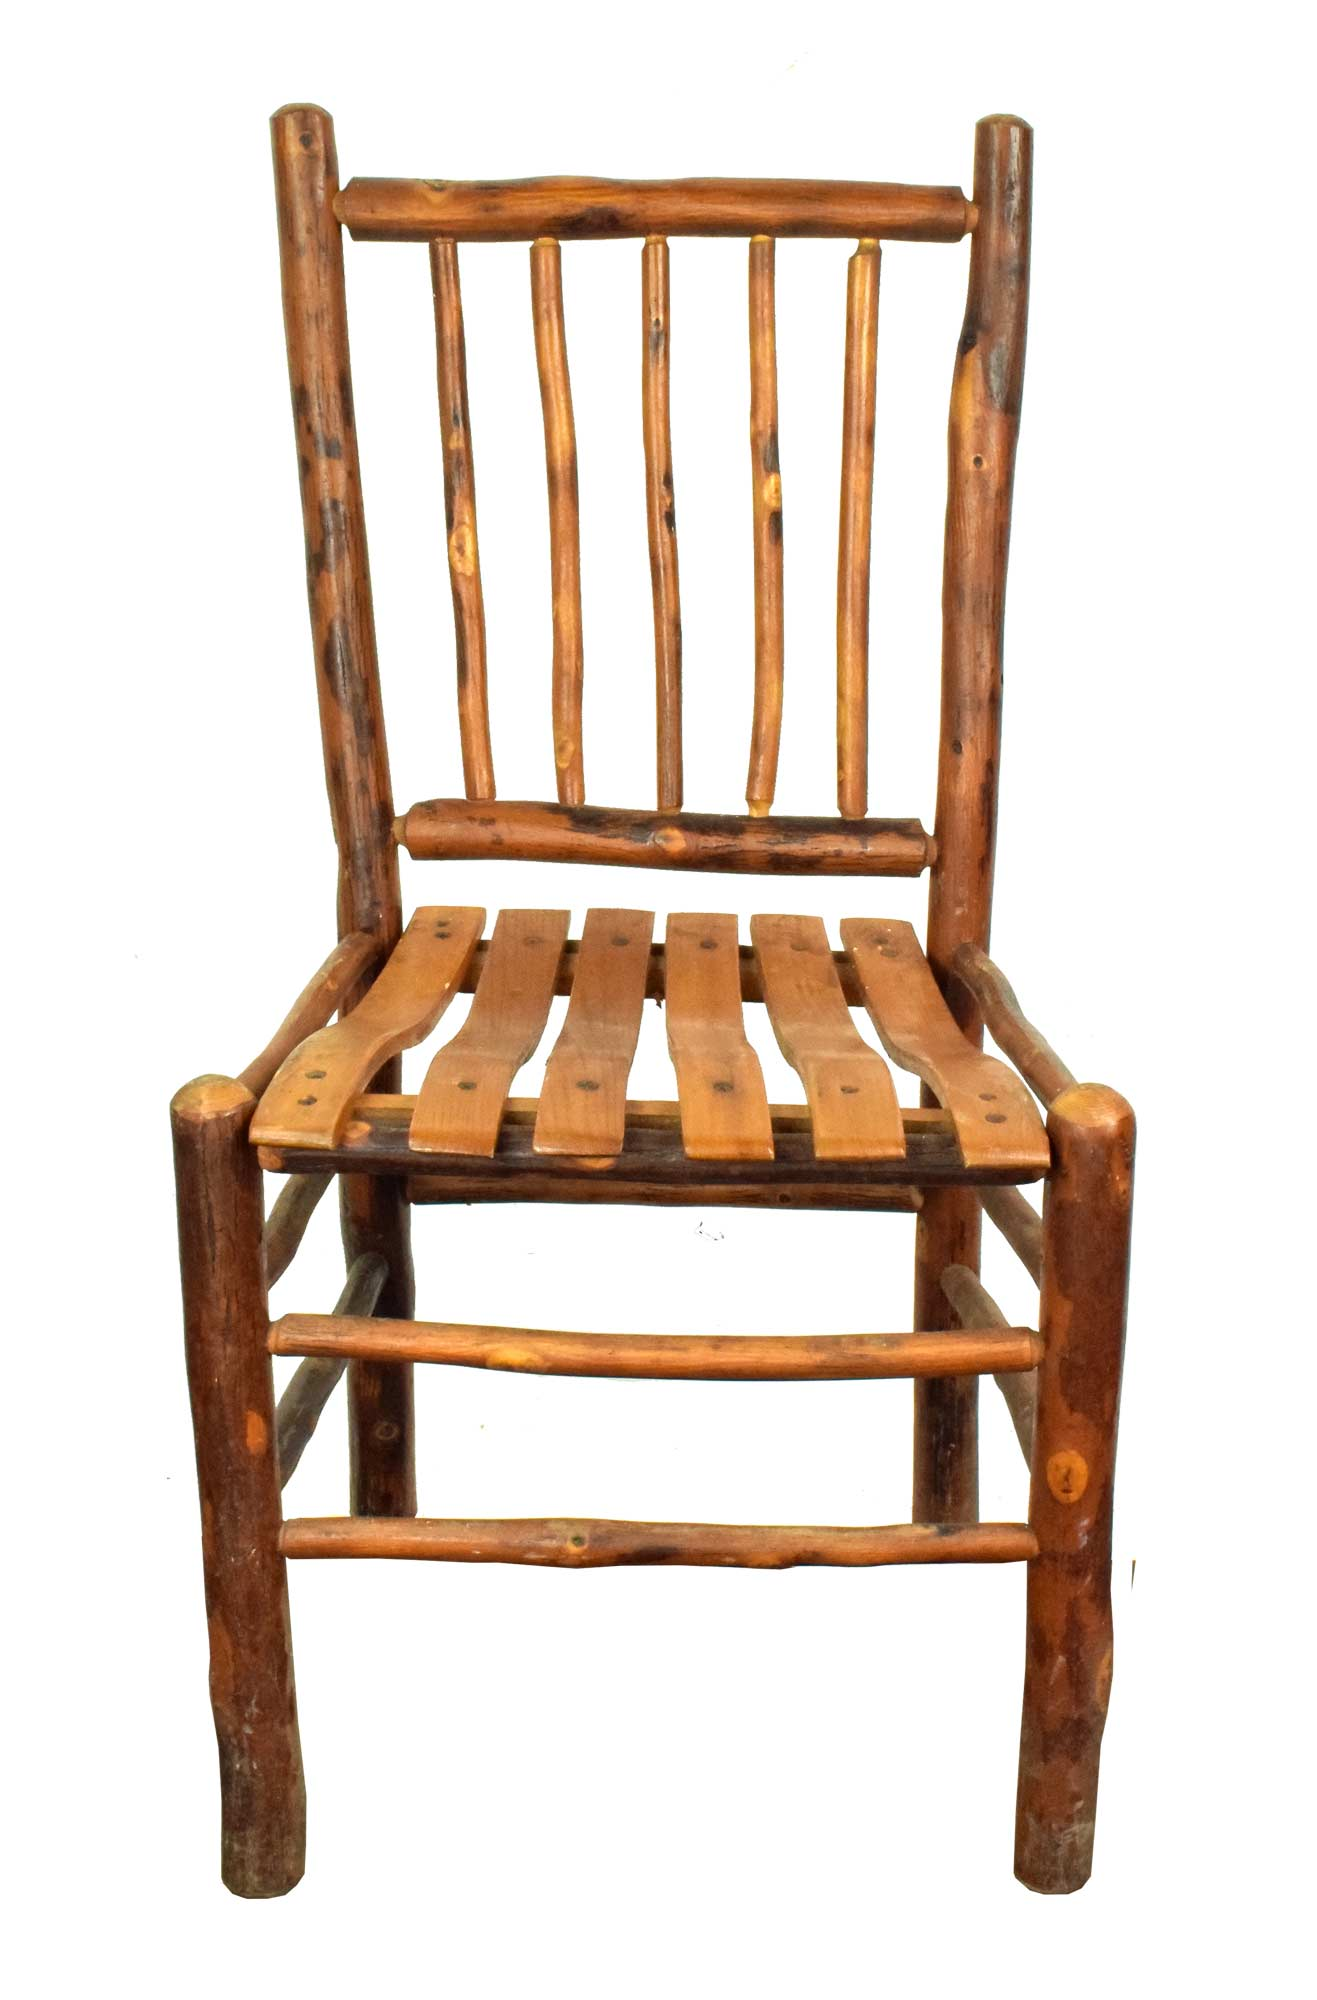 46894-hickory-chair-set-main-image.jpg